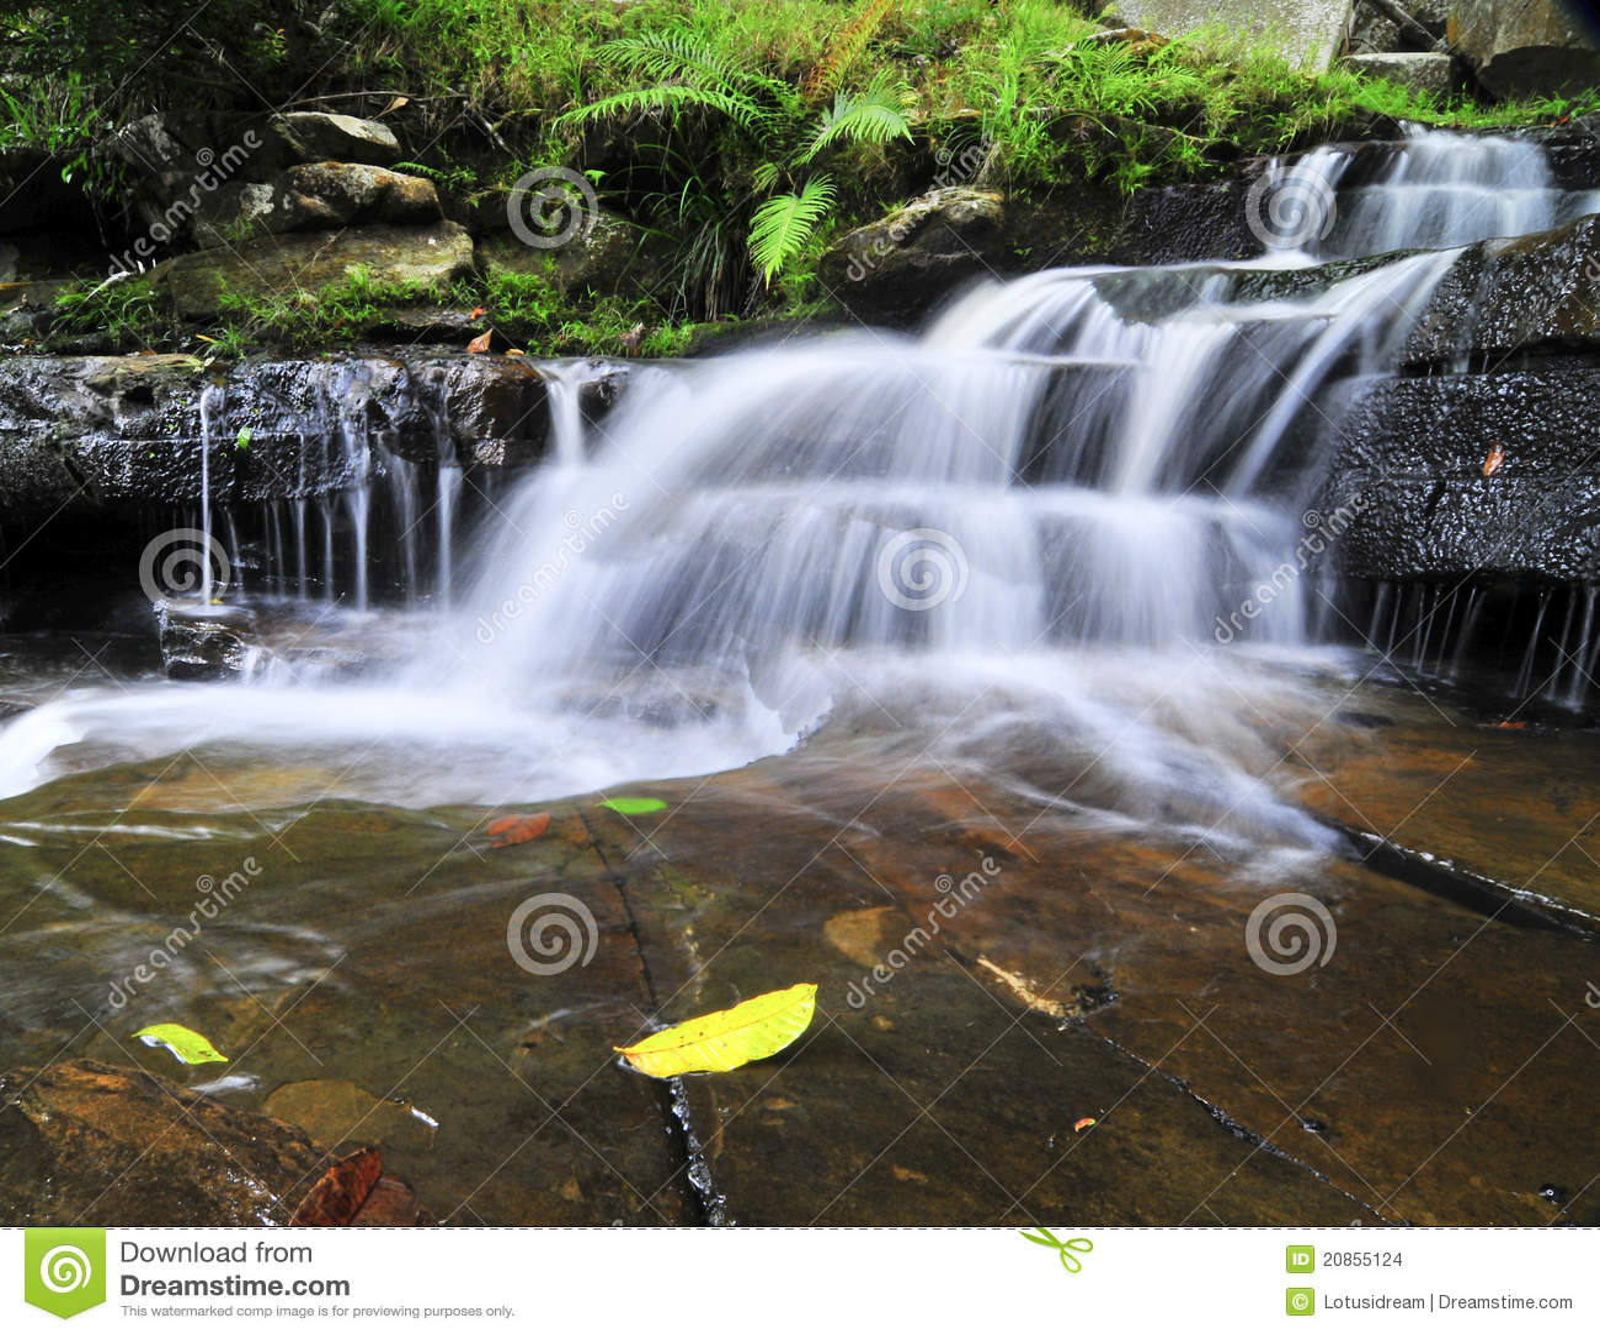 beautiful soft waterfall in - photo #4